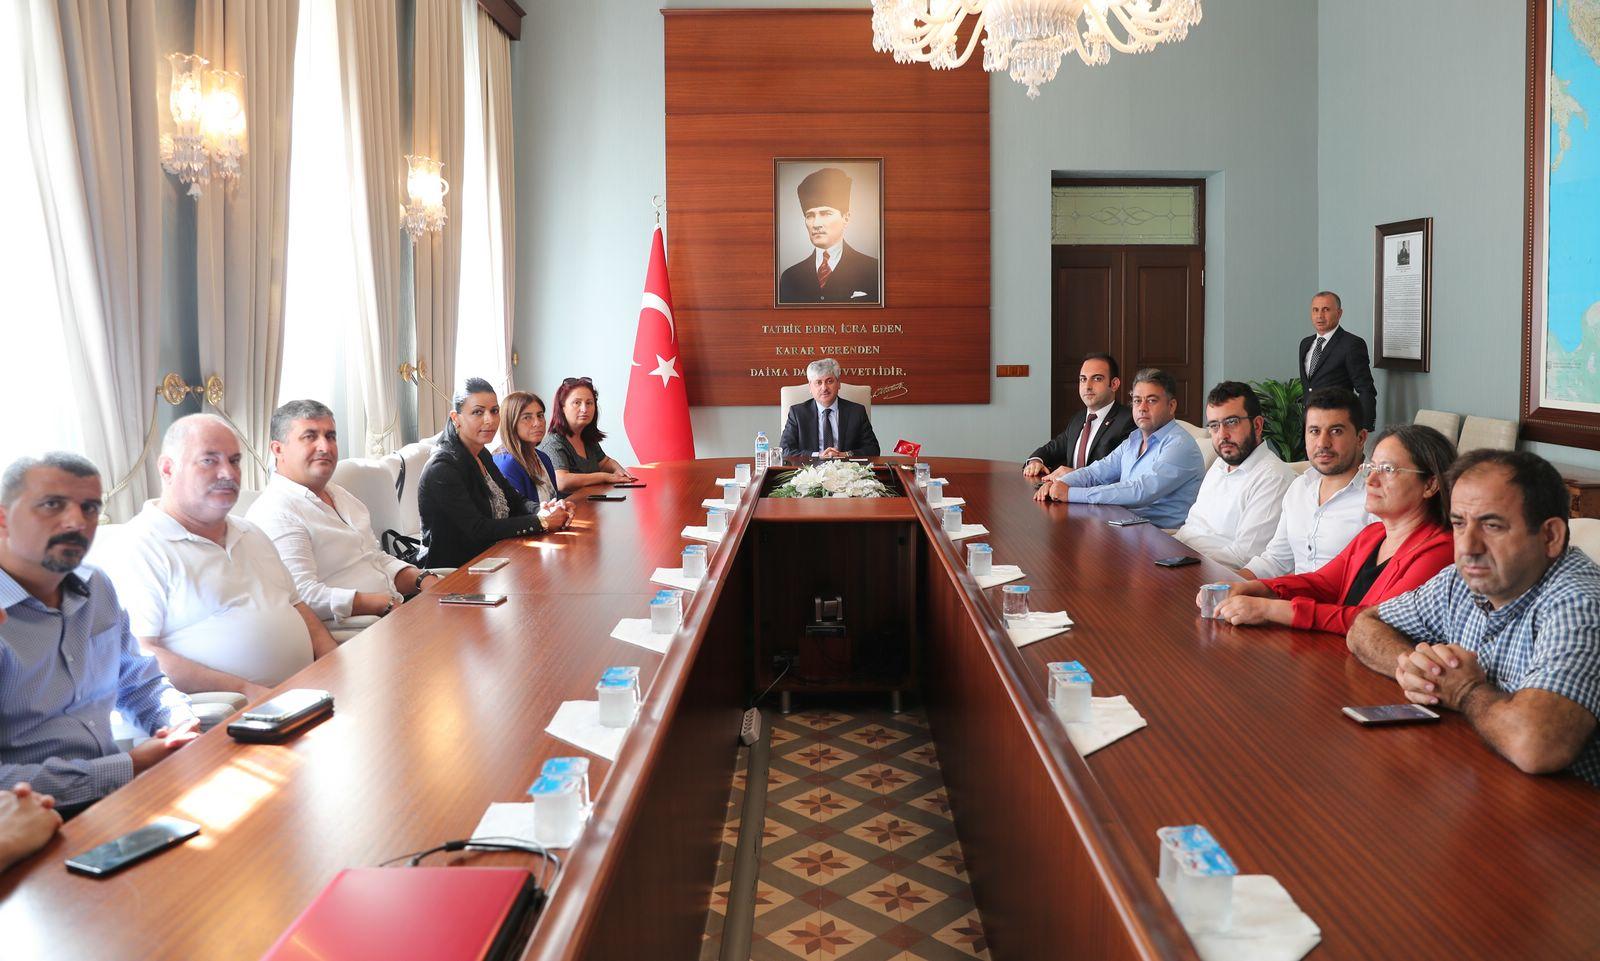 CHP Heyetinden Vali Doğan'a Taziye Ziyareti